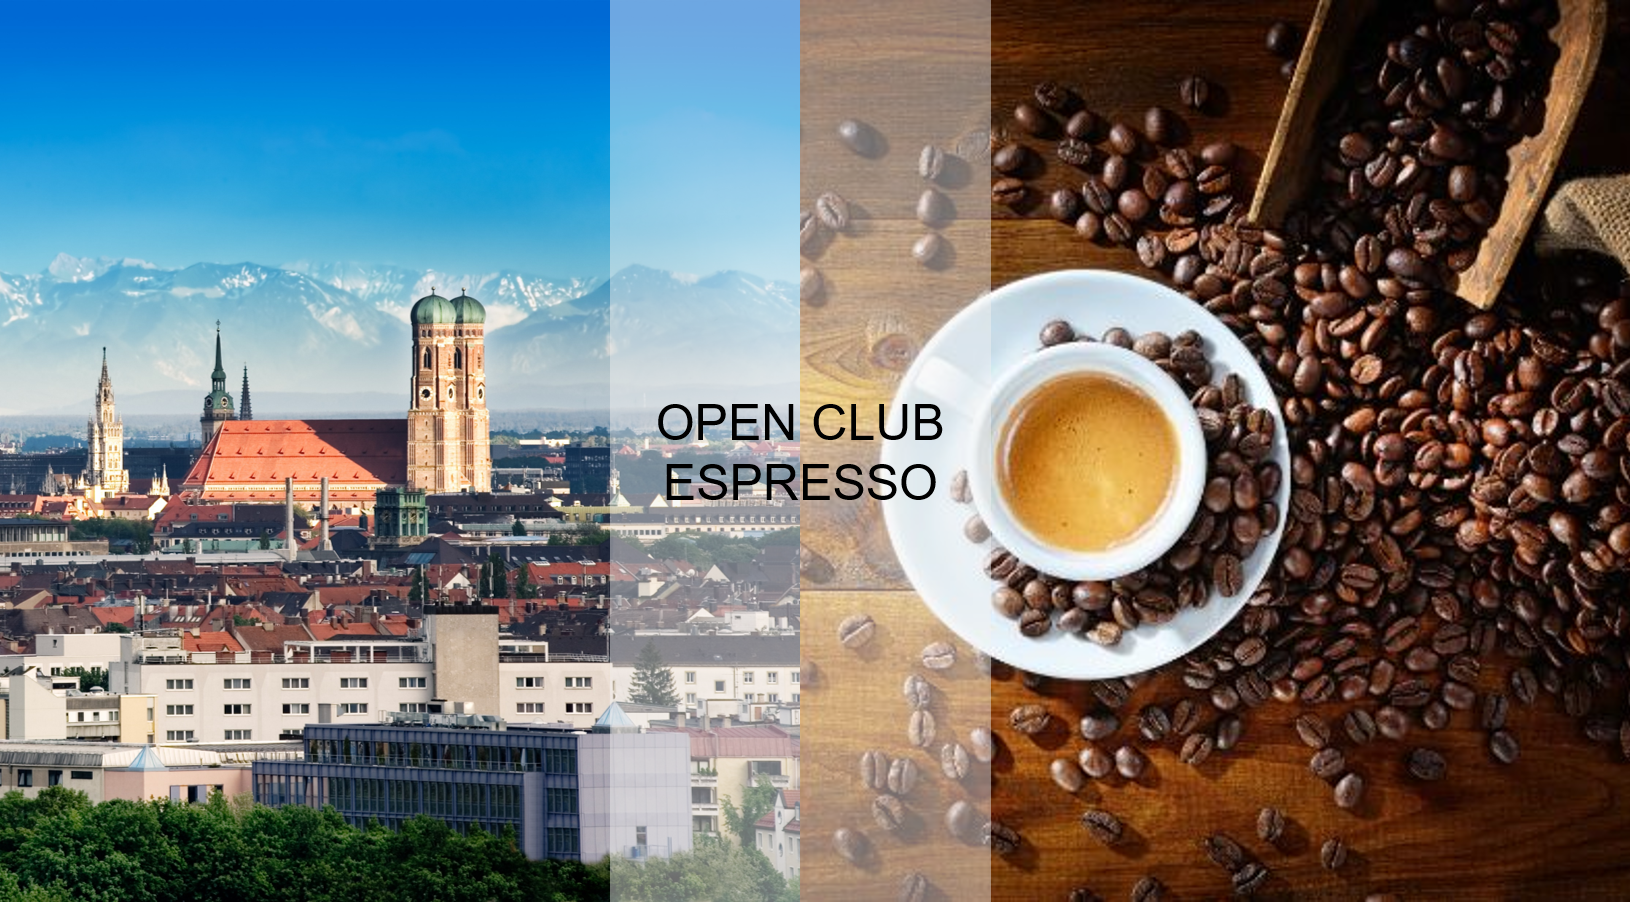 Open Club Espresso (München) - September